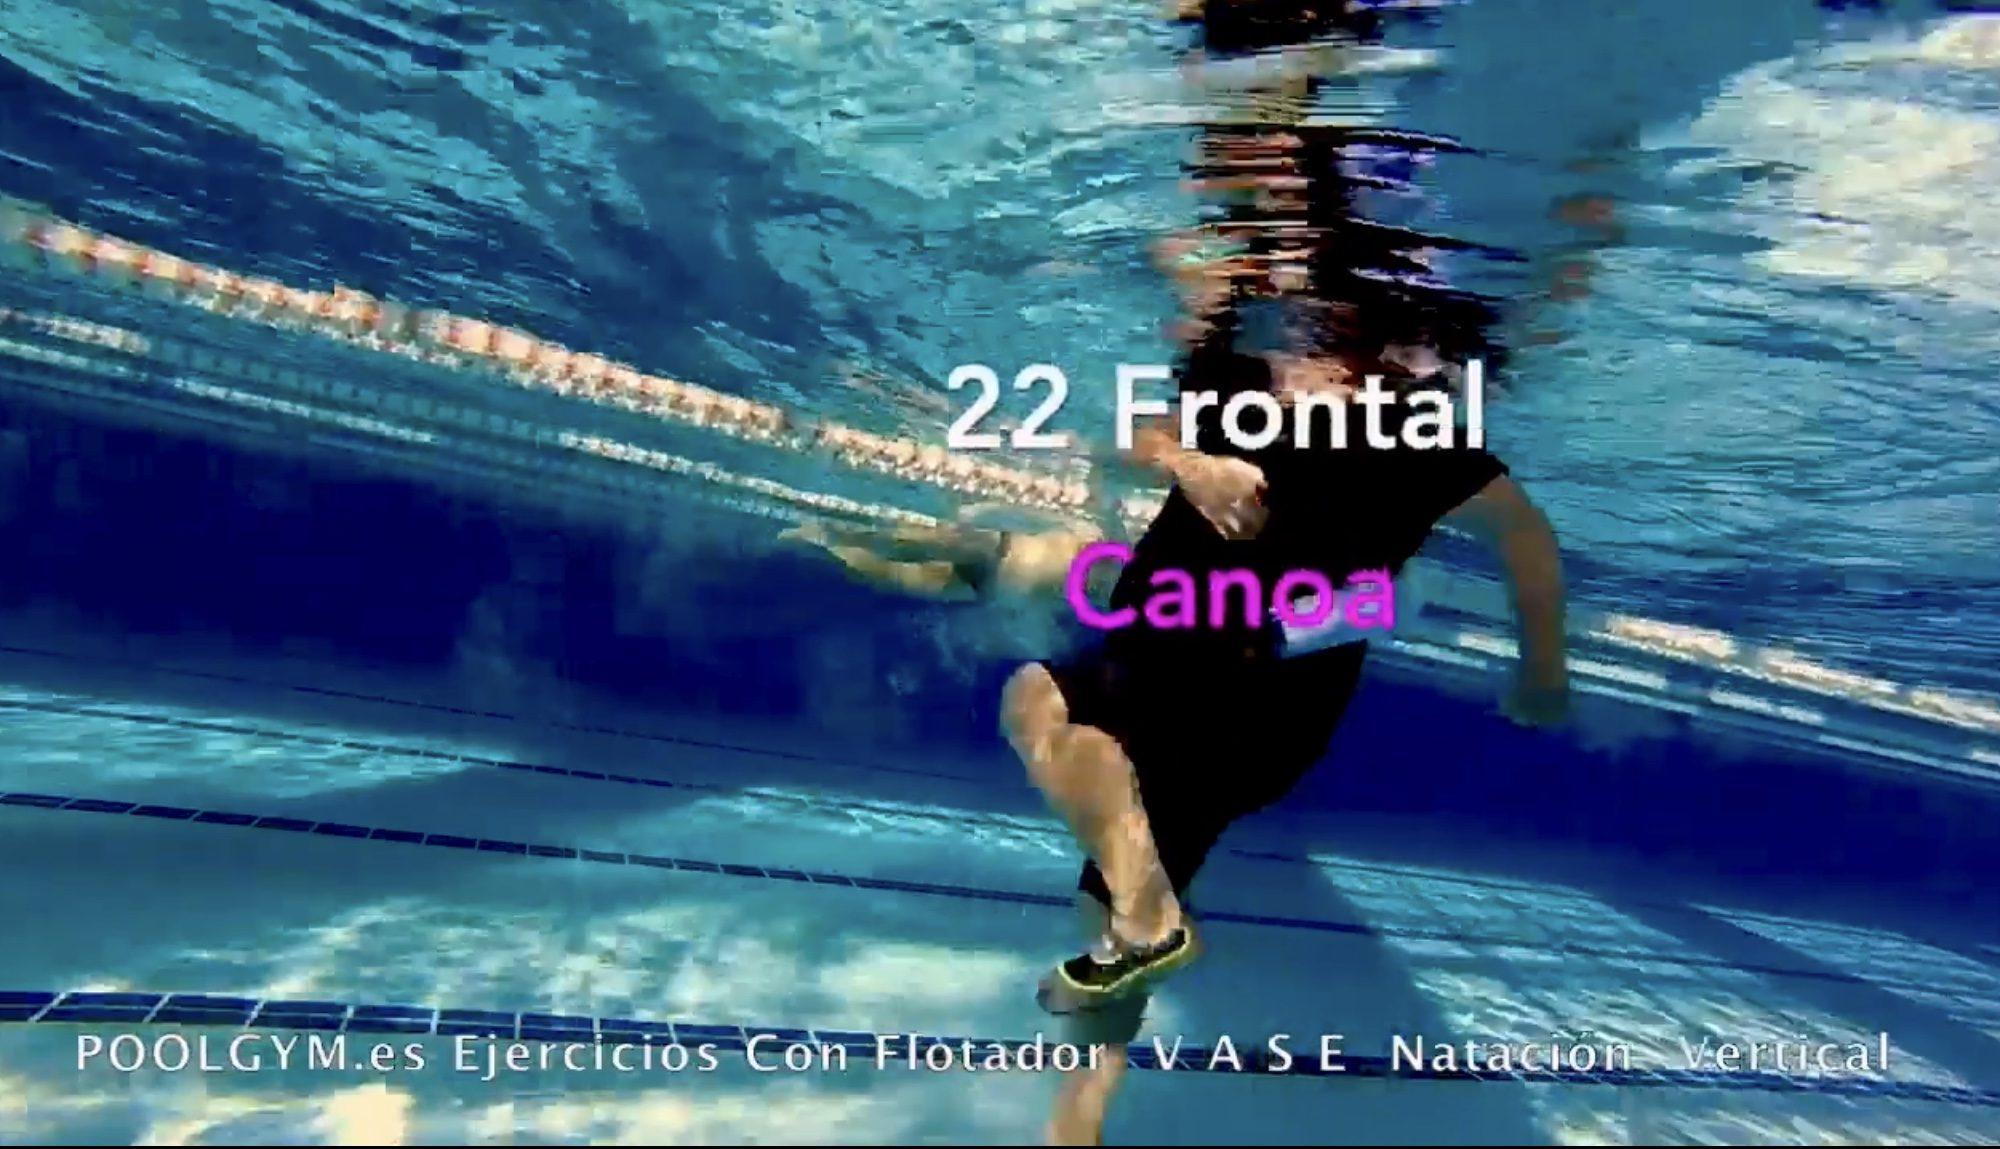 22 Frontal CANOA poolgym.ES